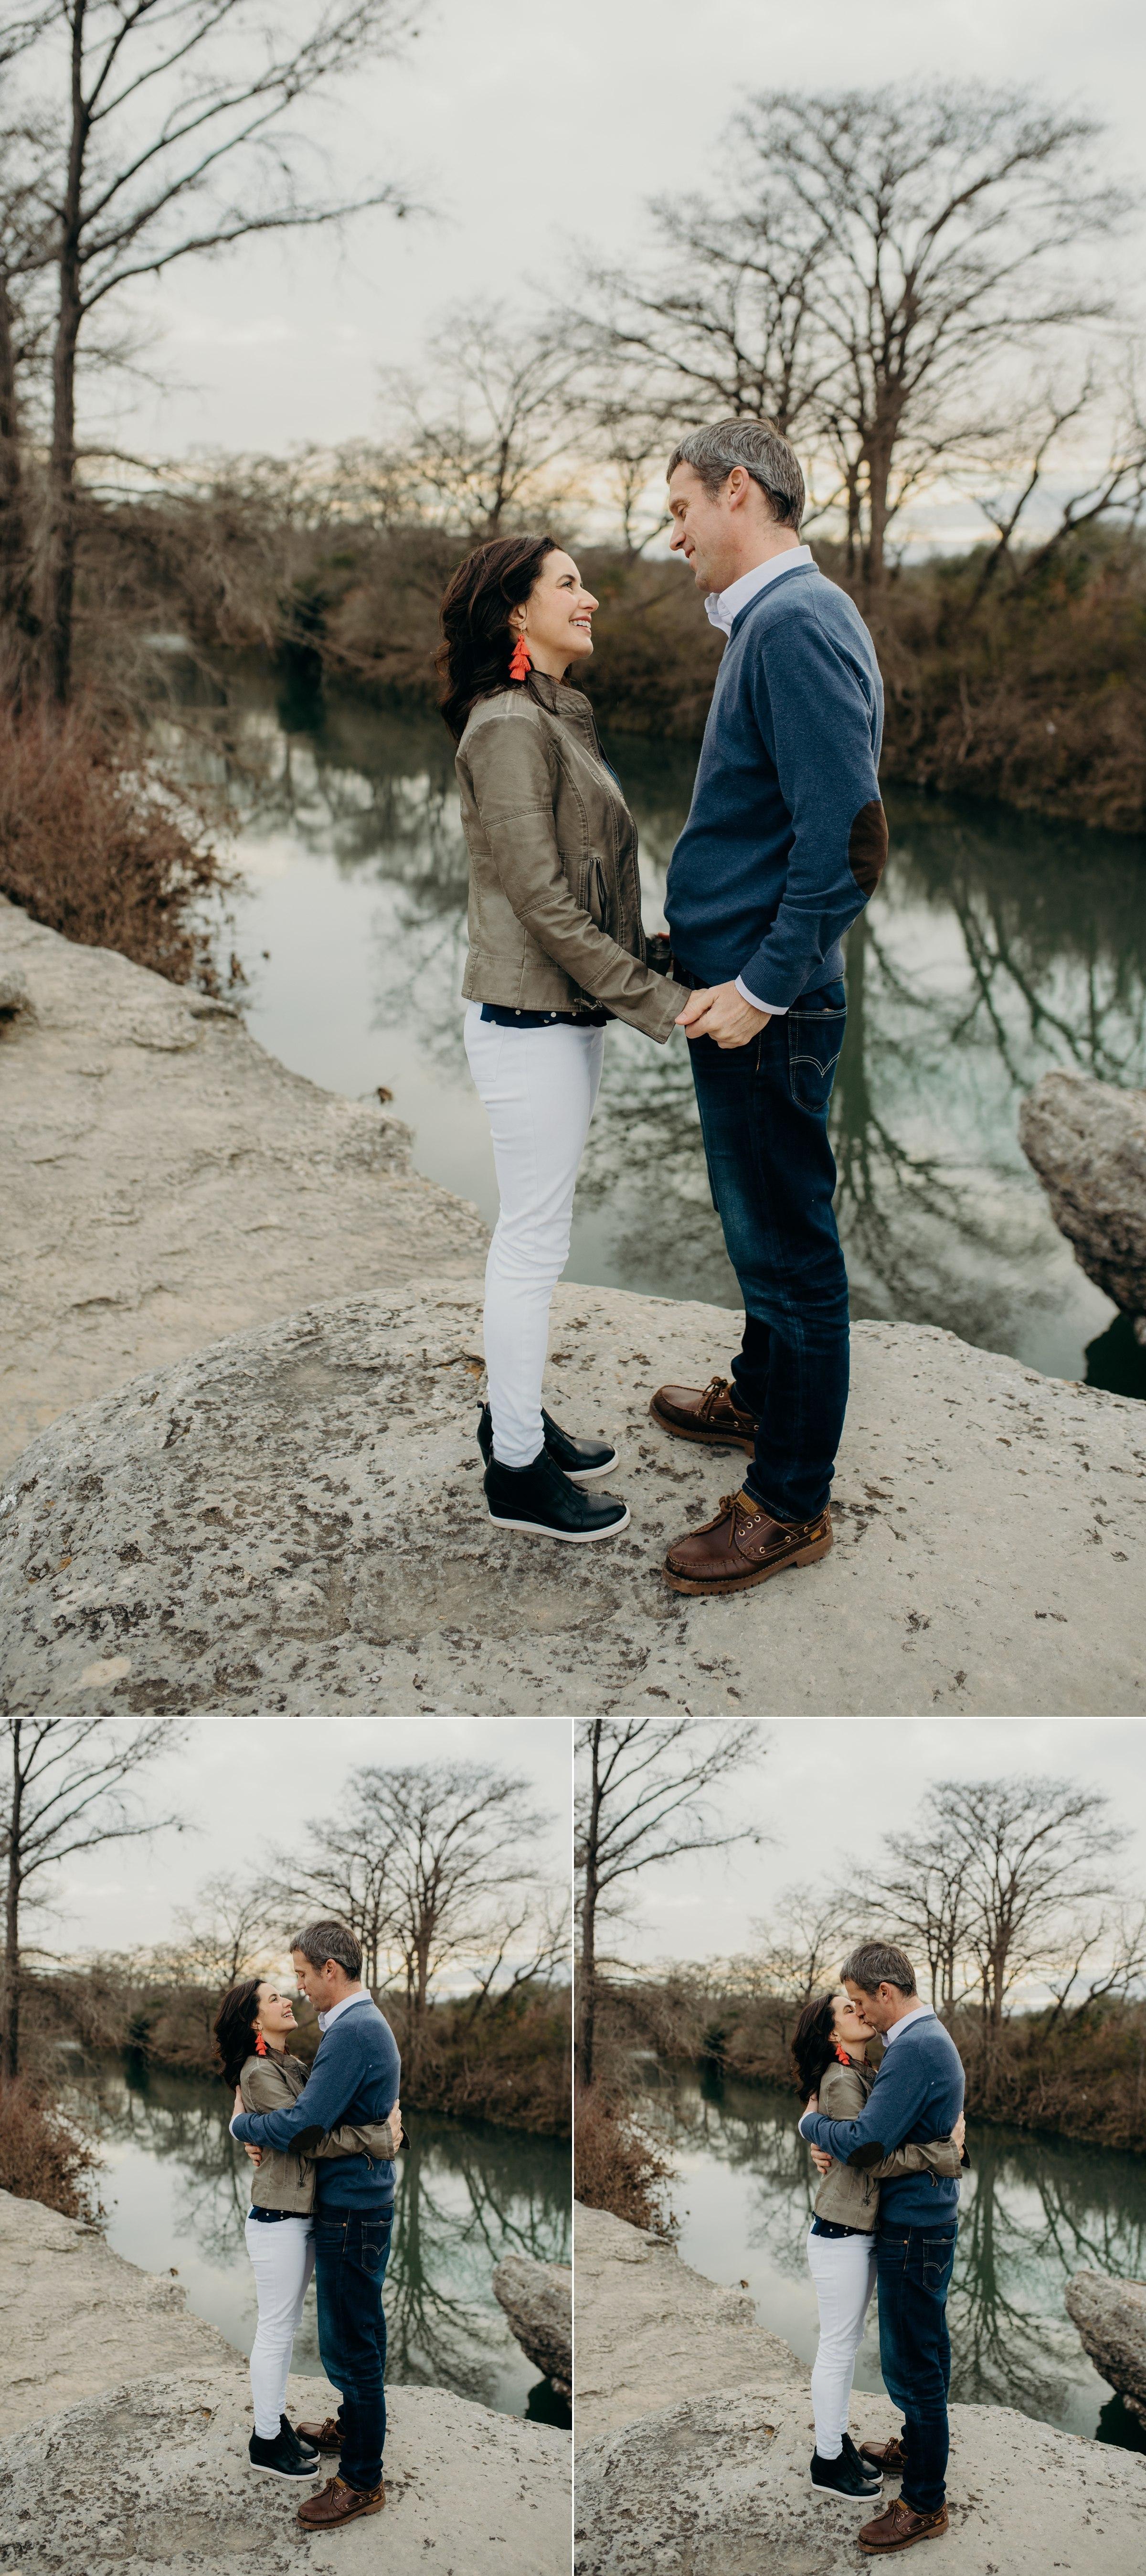 austin-mckinney-falls-engagement-photographer-elopement-prices-best-headshot-senior-adventurous-italy-minneapolis-texas-minnesota-dallas-houston-tulum-mexico_0029.jpg